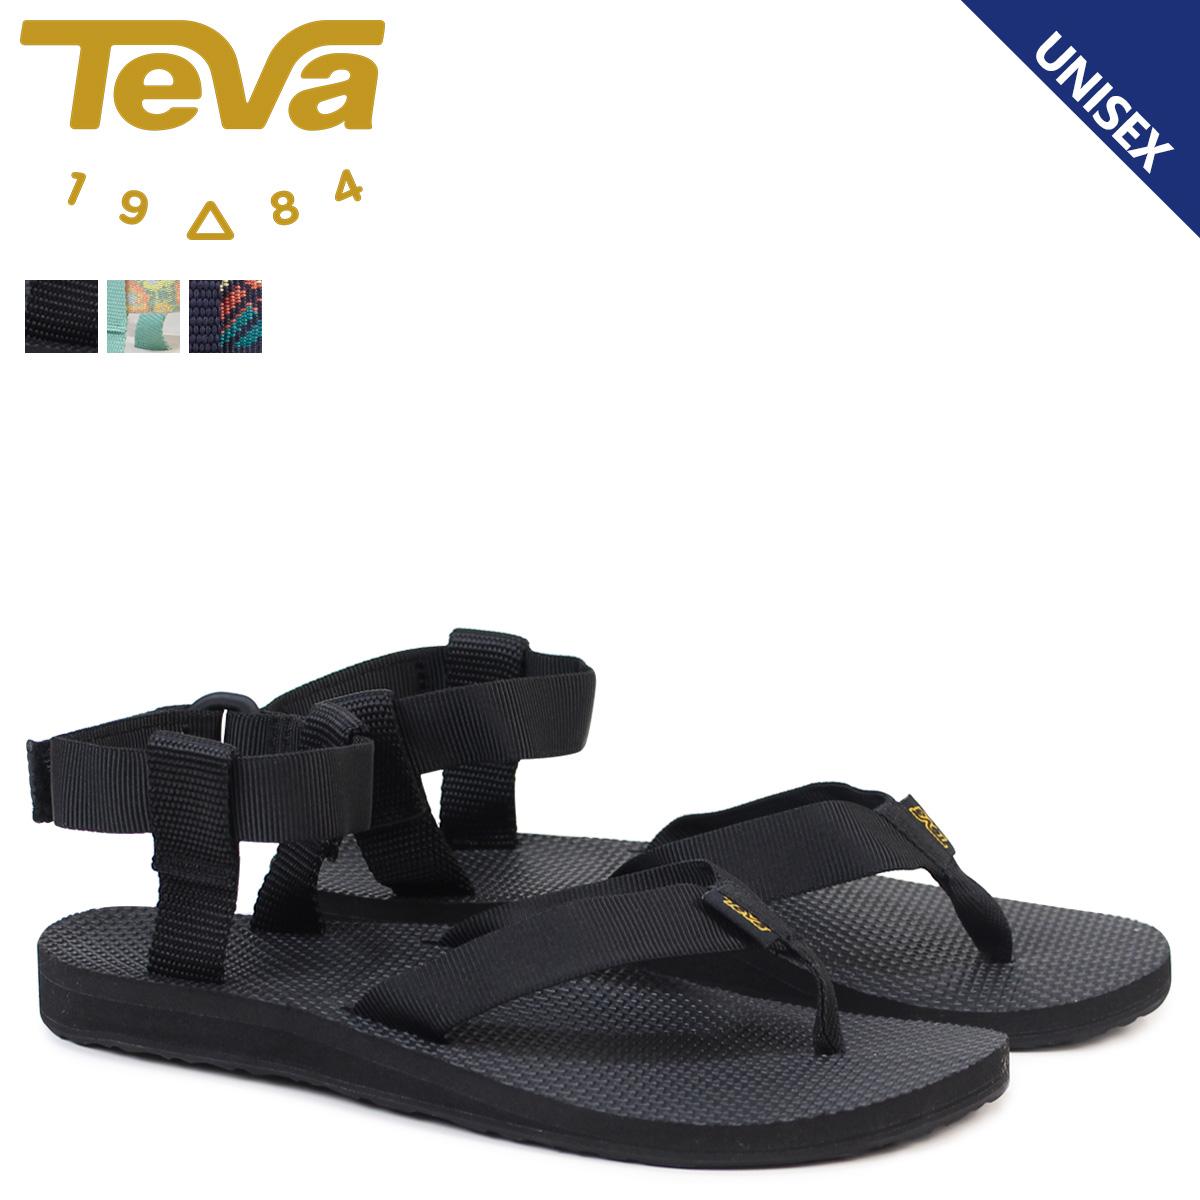 huge inventory 2018 sneakers hot new products Sugar Online Shop: Teva Teva sandals Lady's men original ORIGINAL ...